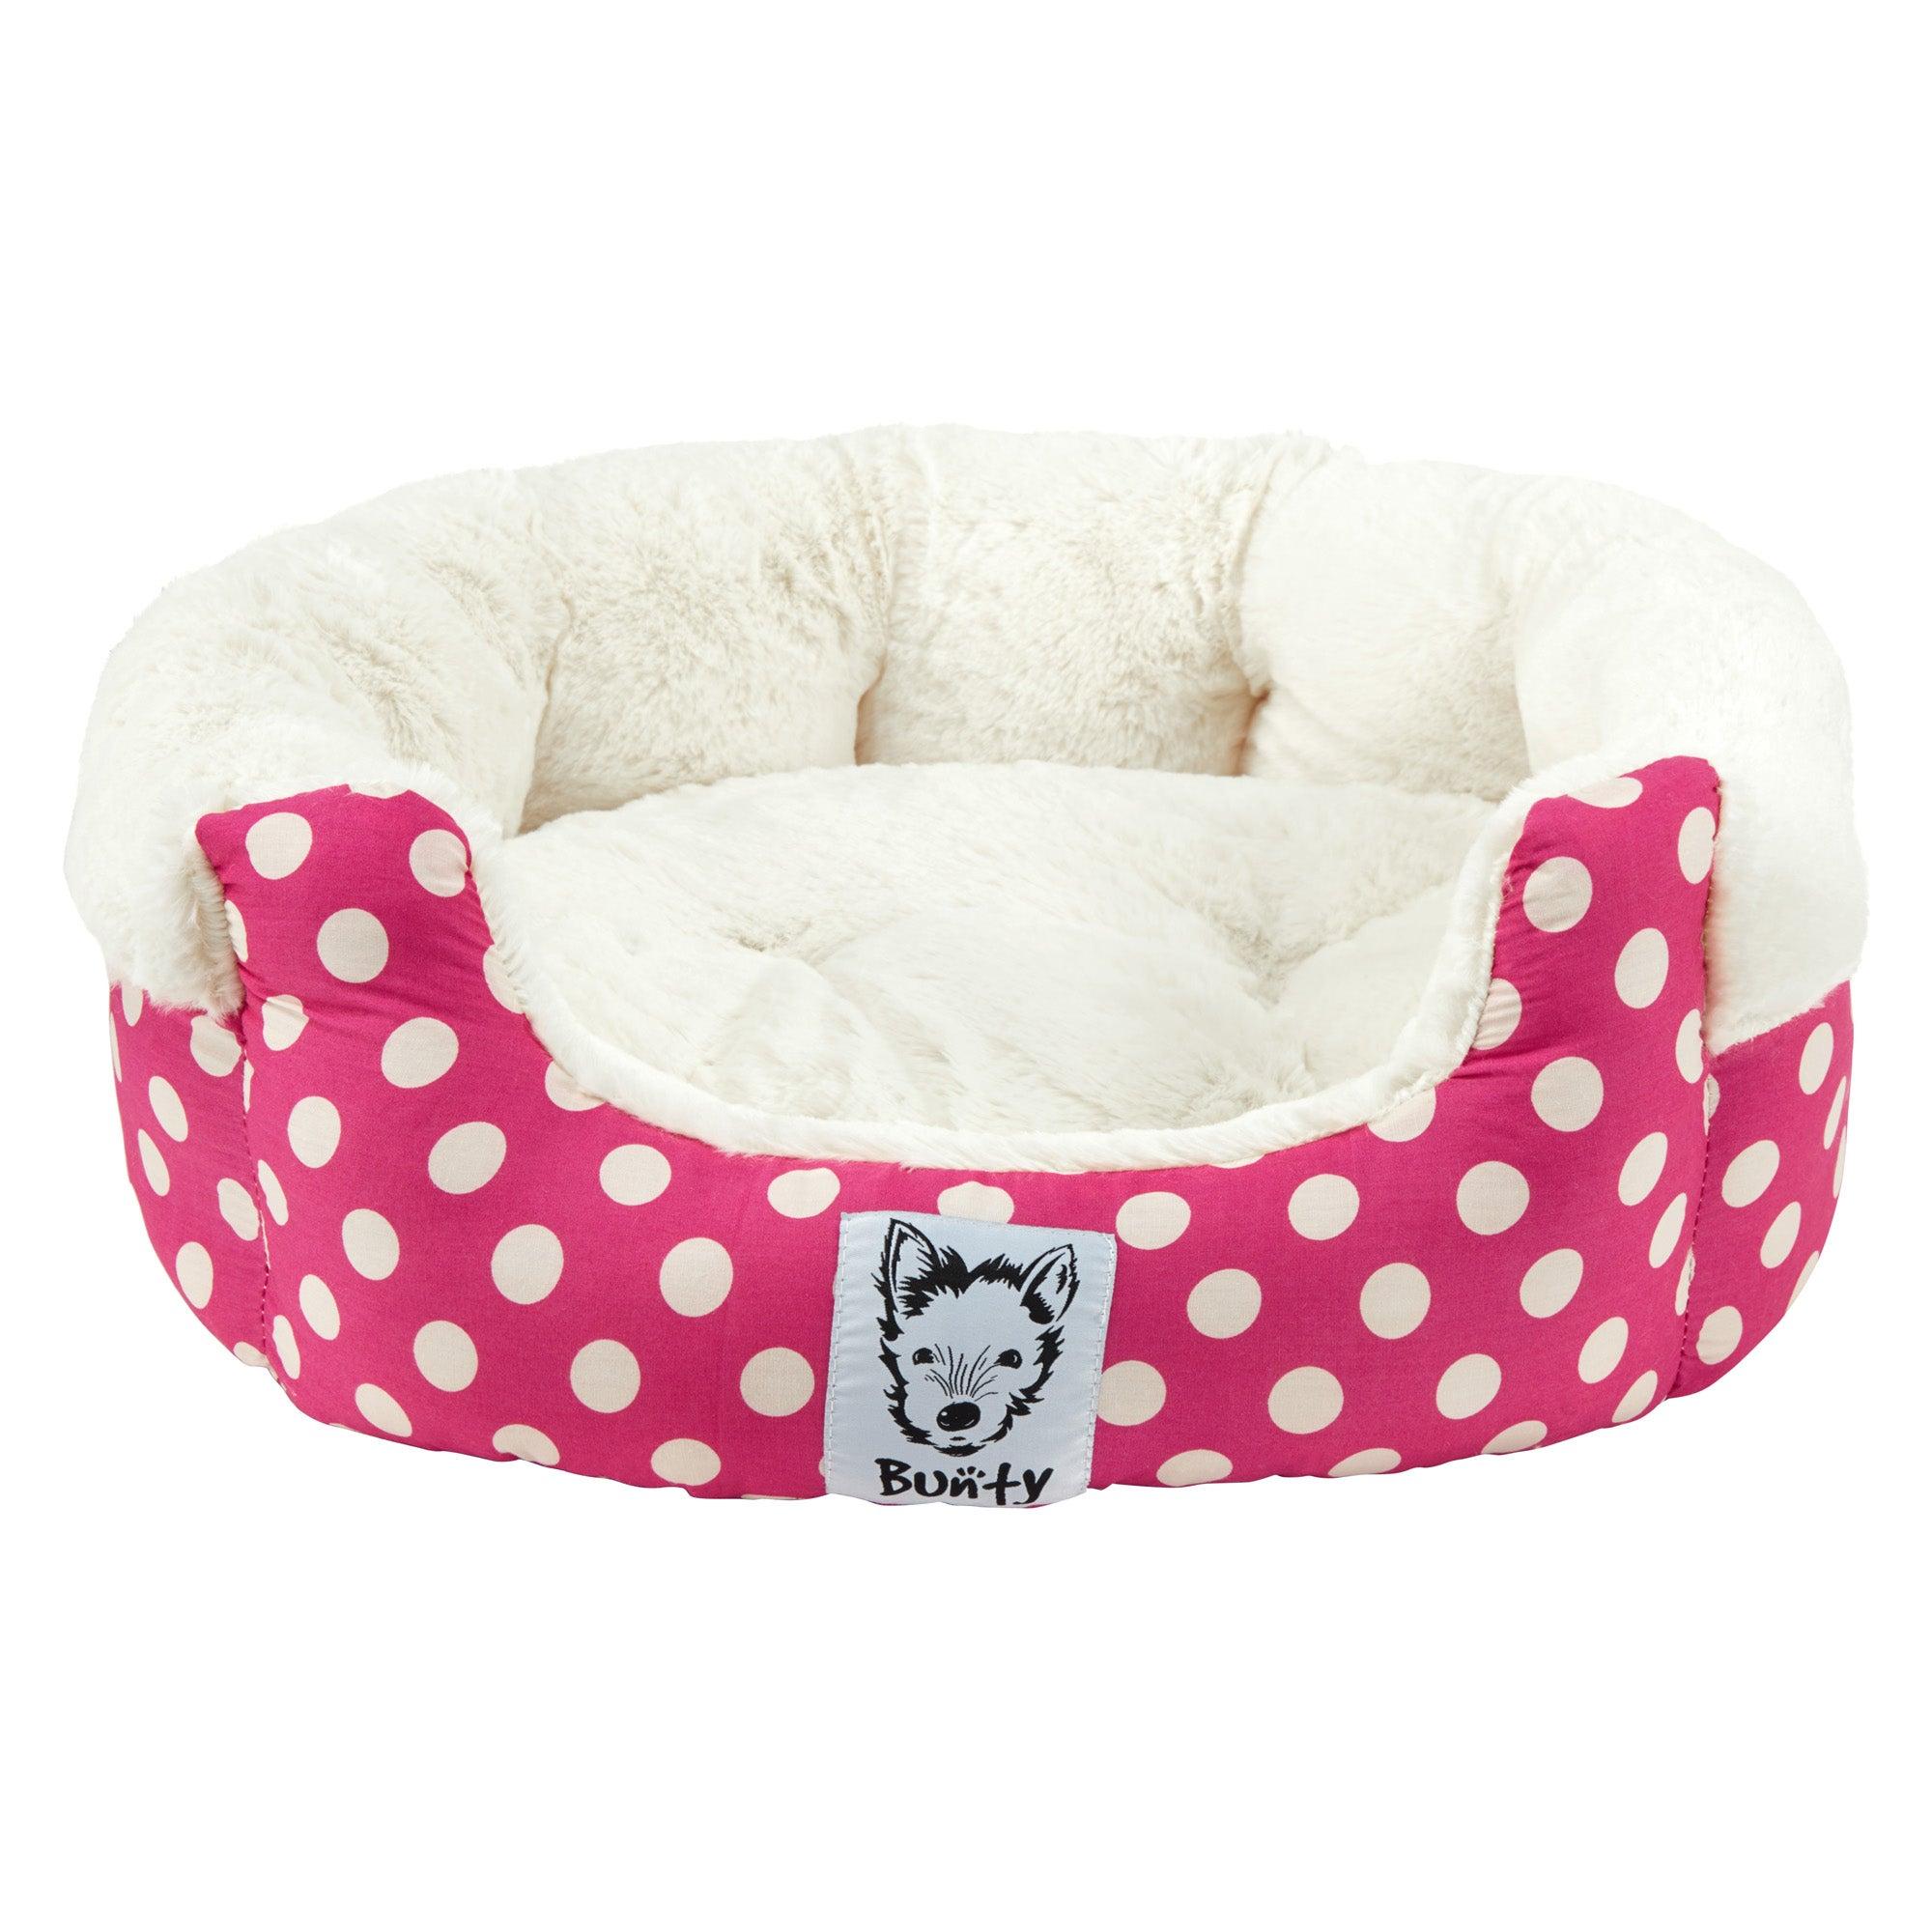 Bunty Pink Deep Dream Dog Bed Pink